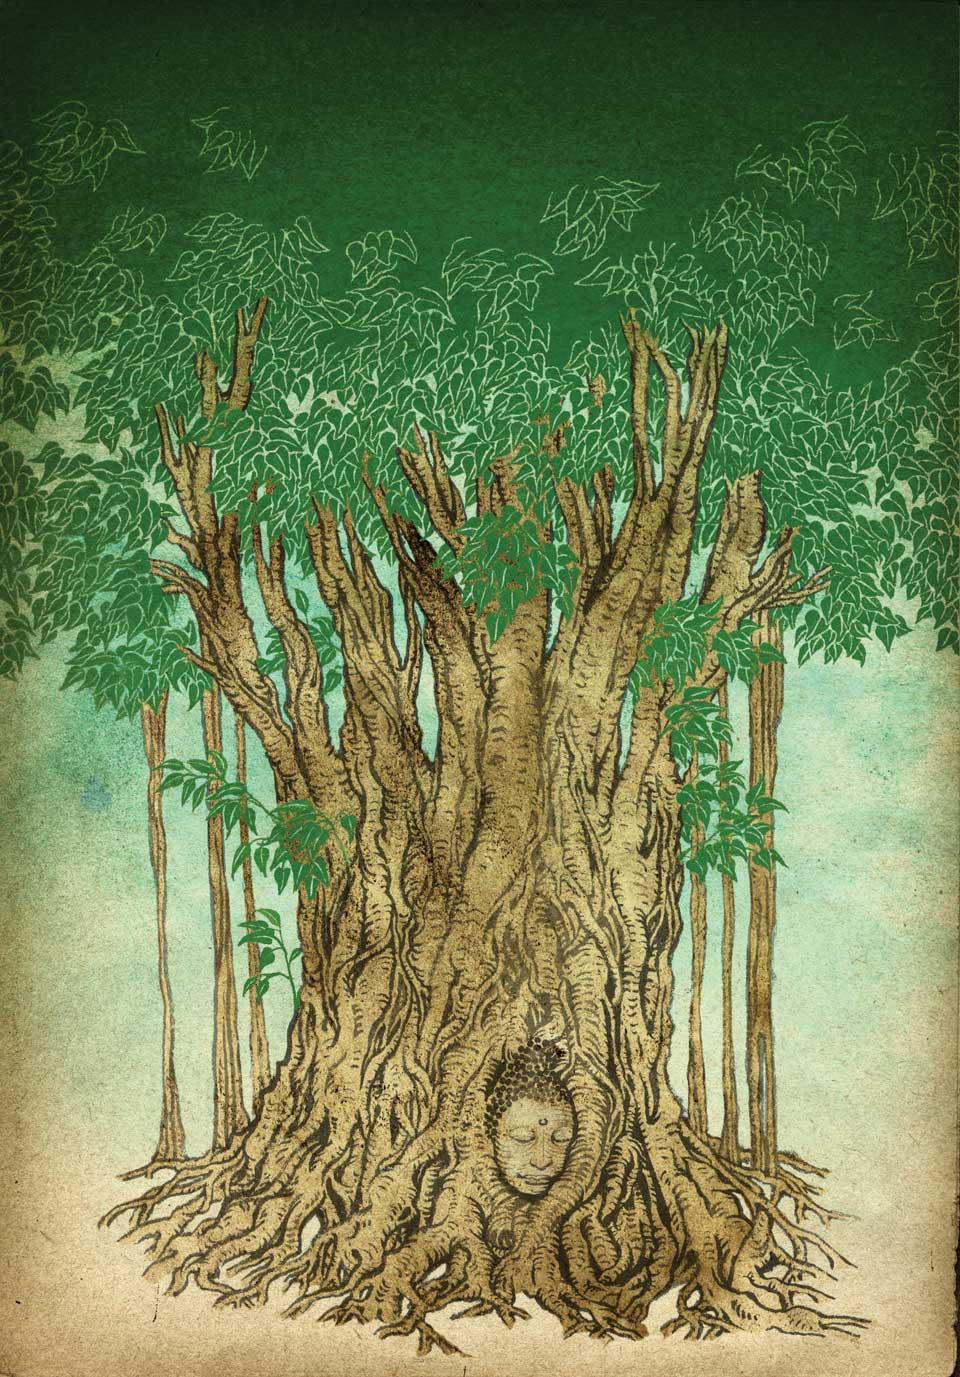 https://i0.wp.com/yukoart.com/wp-content/uploads/2016/11/harvard_divinity_cover_bodhai_tree.jpg